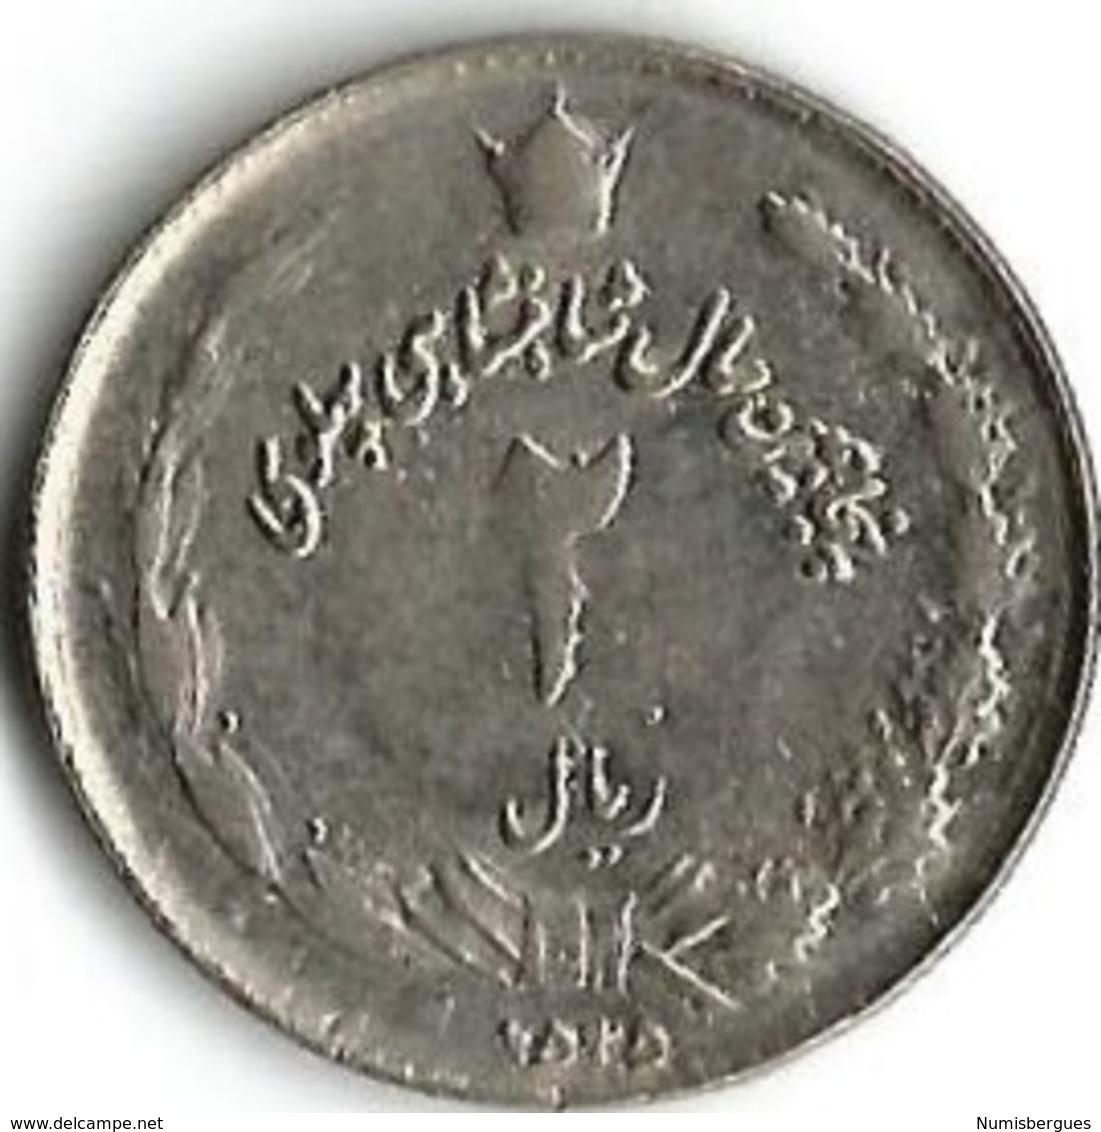 1 Pièce De Monnaie 2 Rials 1976 - Iran